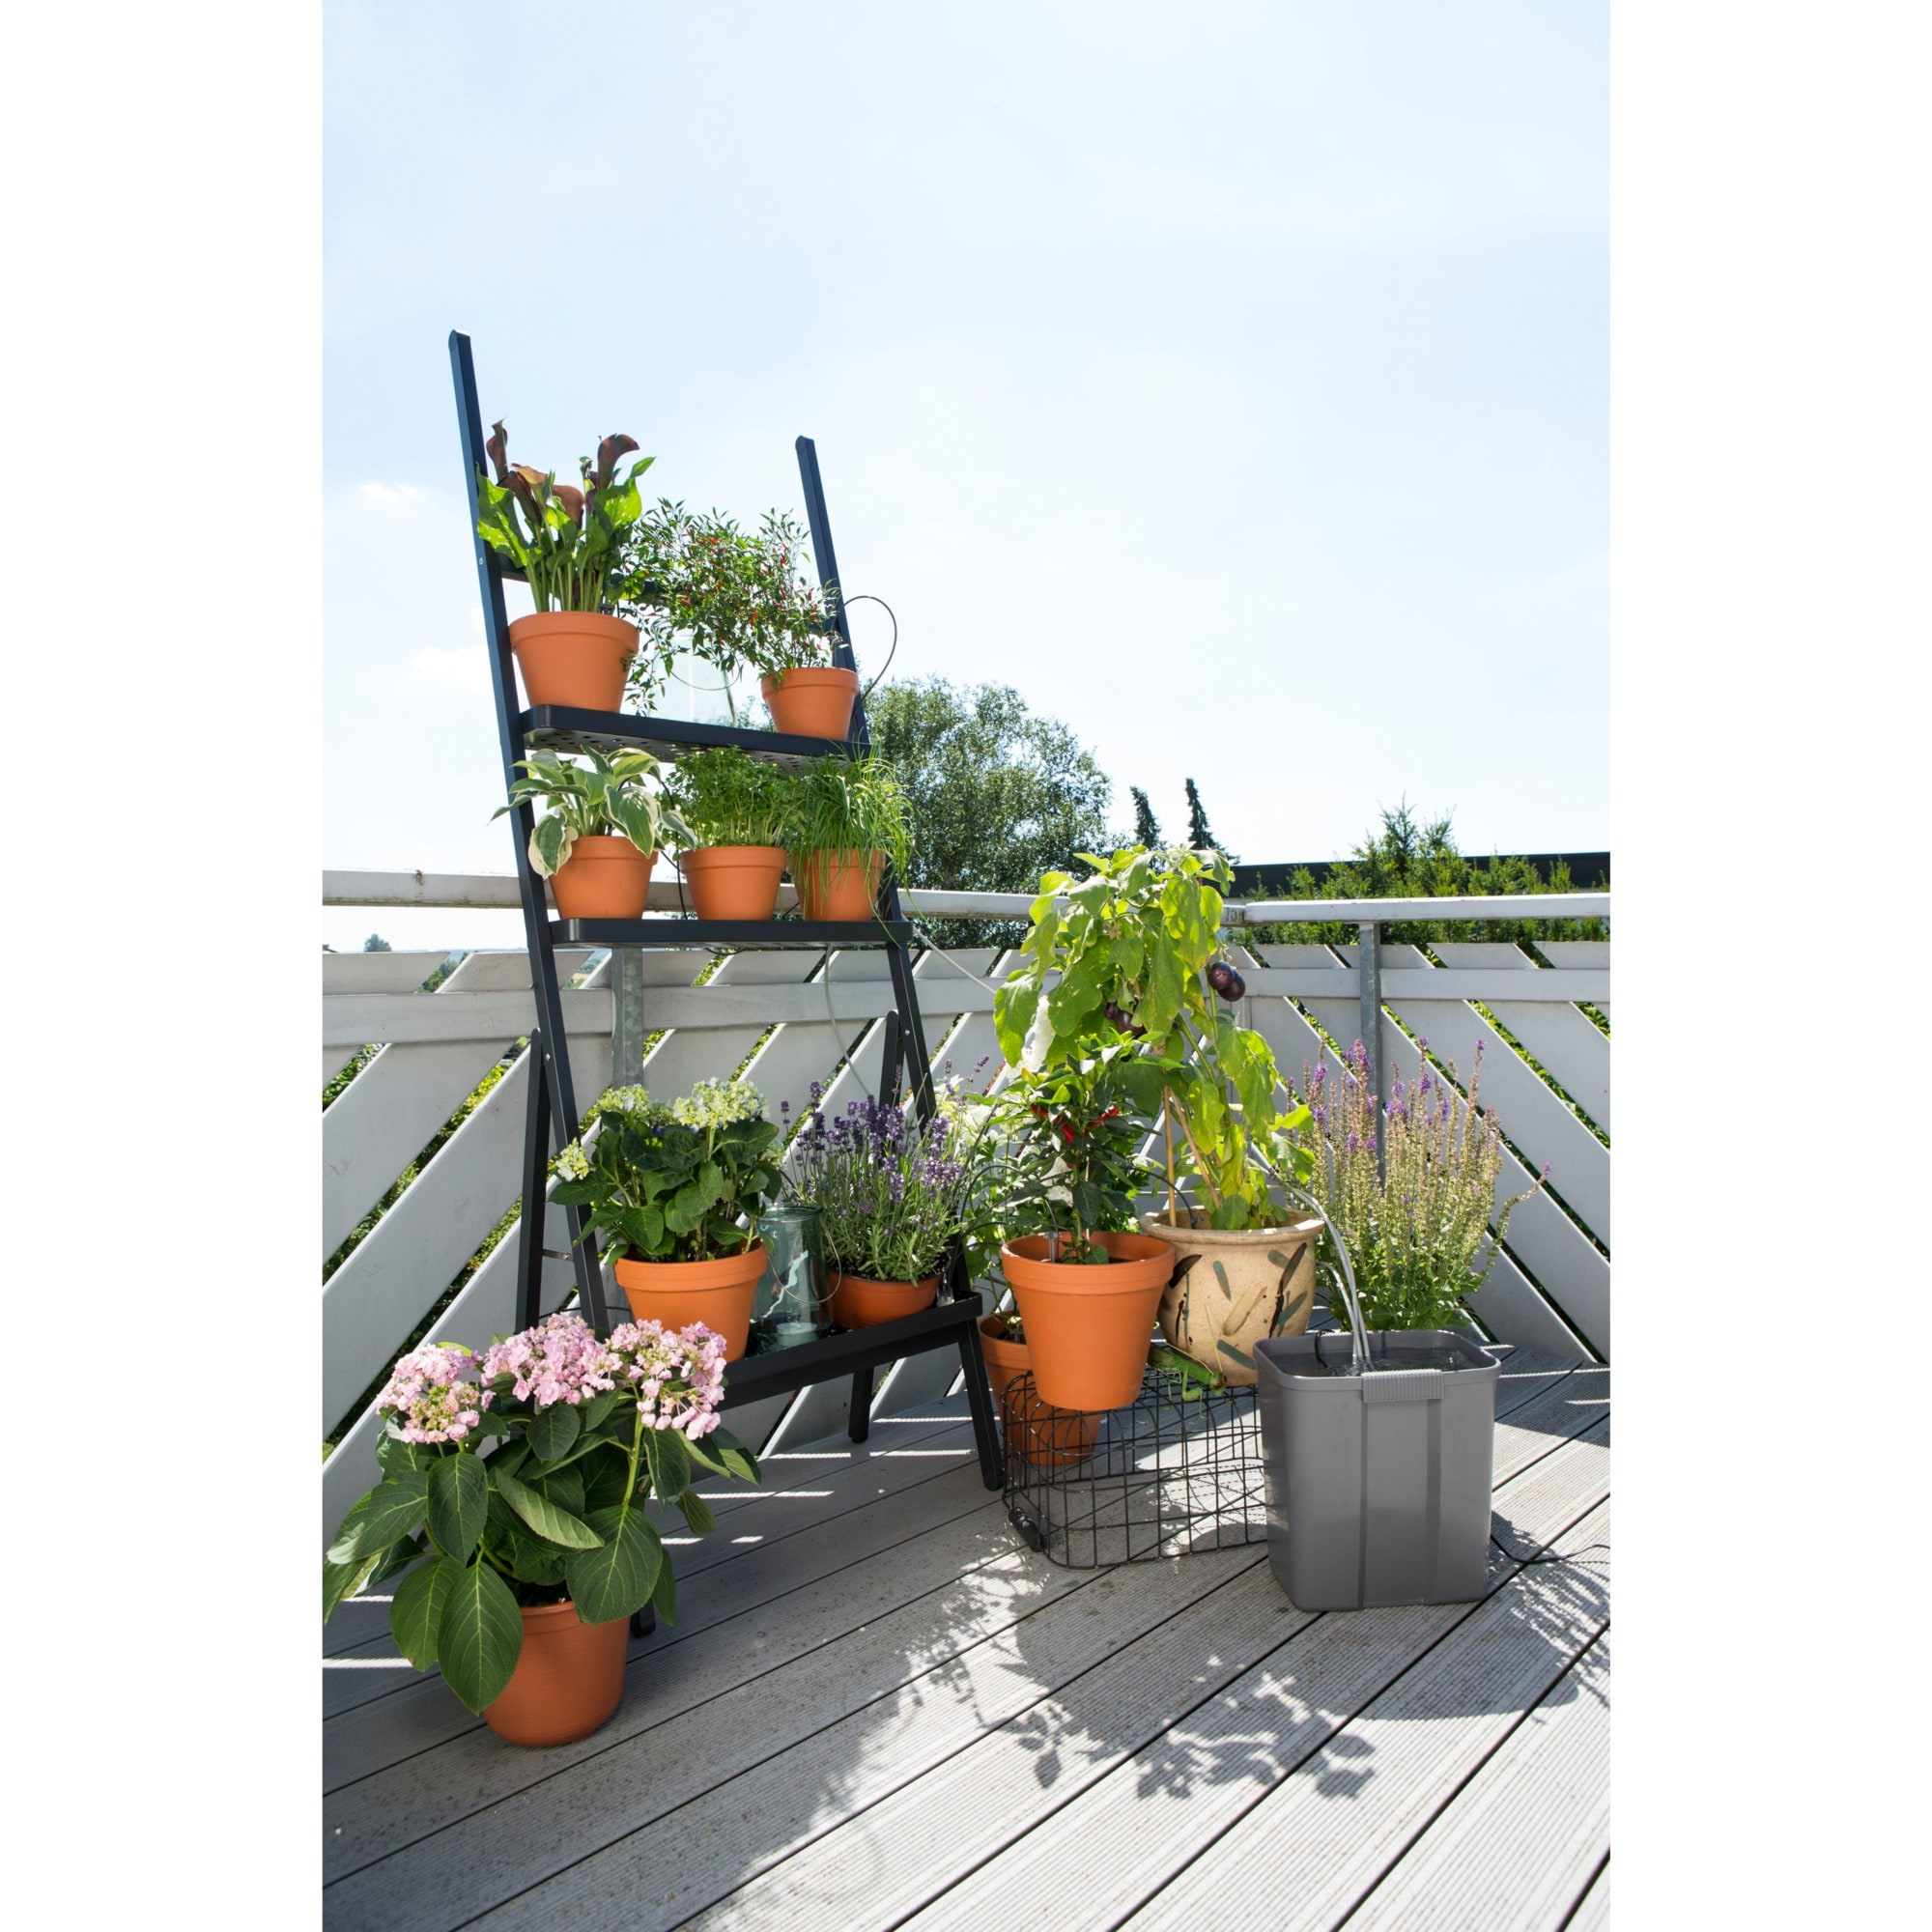 Gardena City Gardening Urlaubsbewässerung-Set (1266-20)